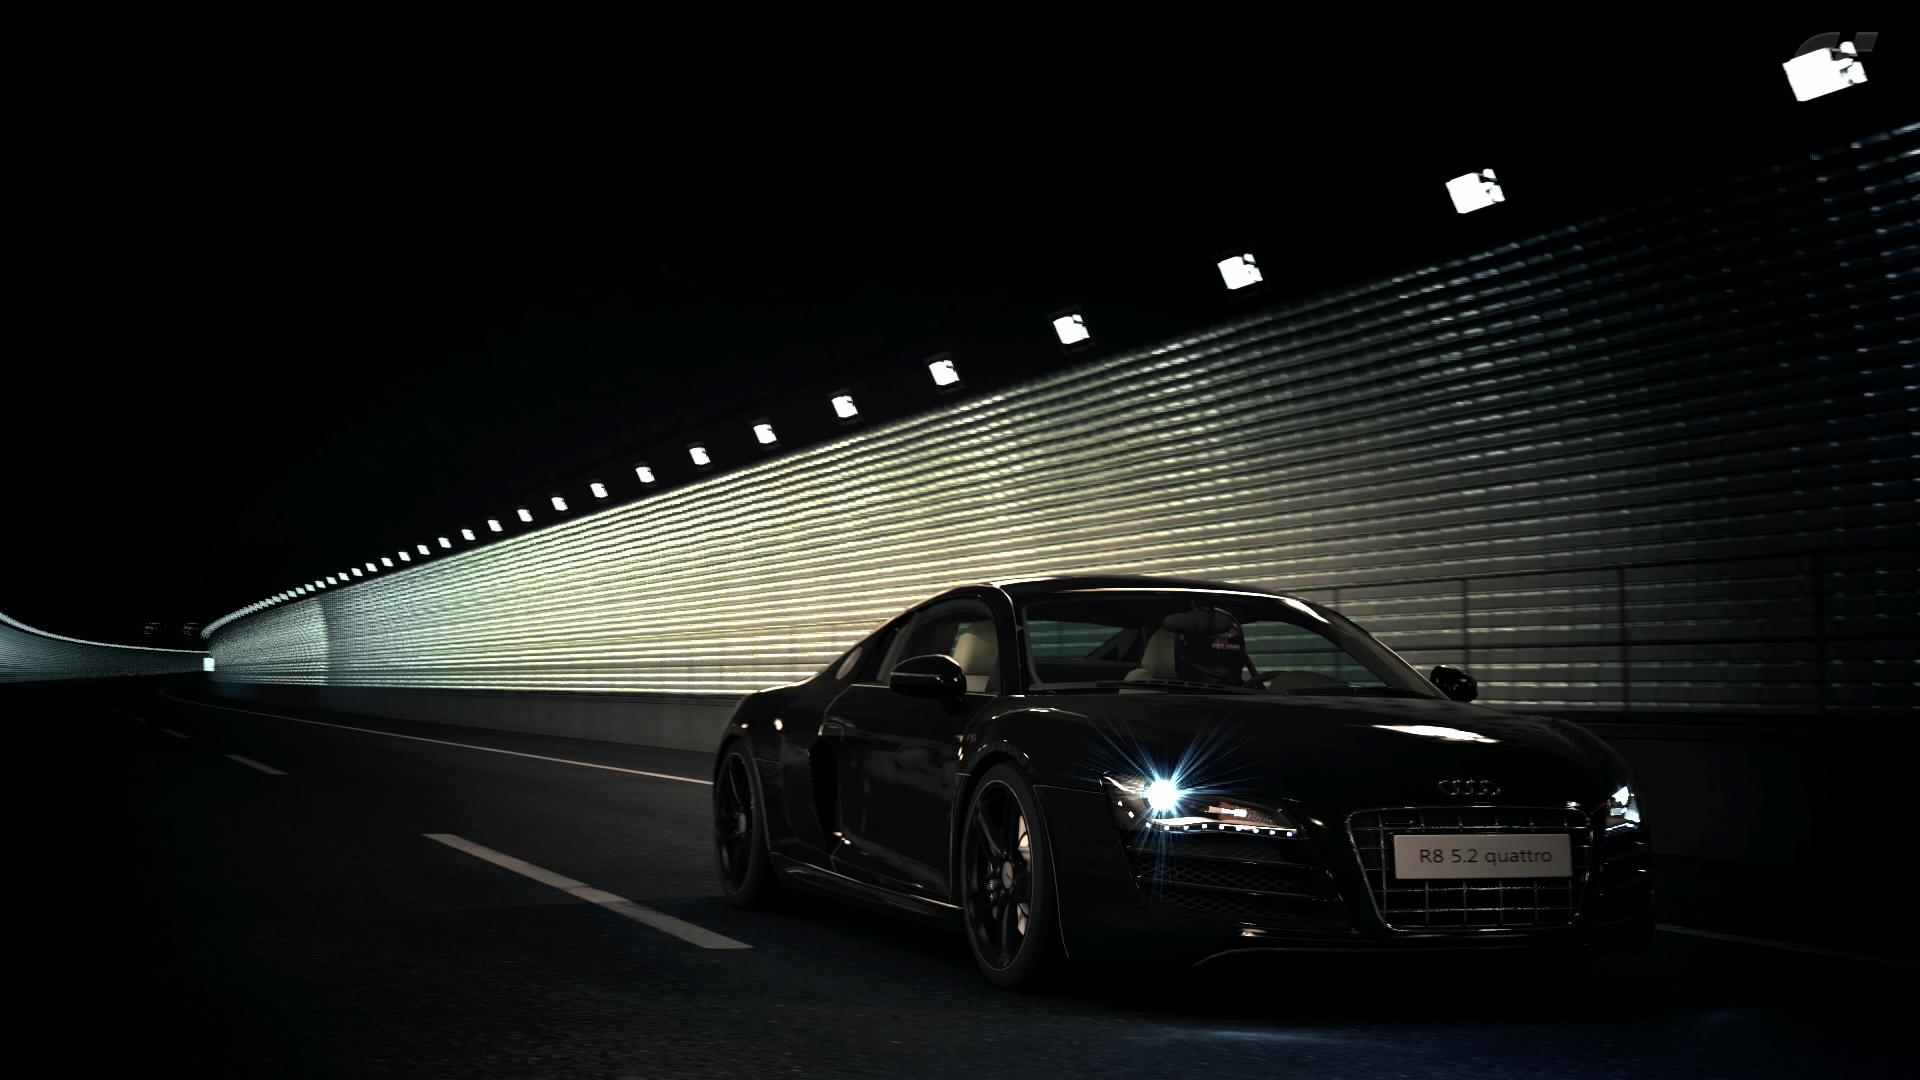 54595d1293591589-gran-turismo-5-special-stage-route-7_14 Fascinating Gran Turismo Psp Bugatti Veyron Price Cars Trend